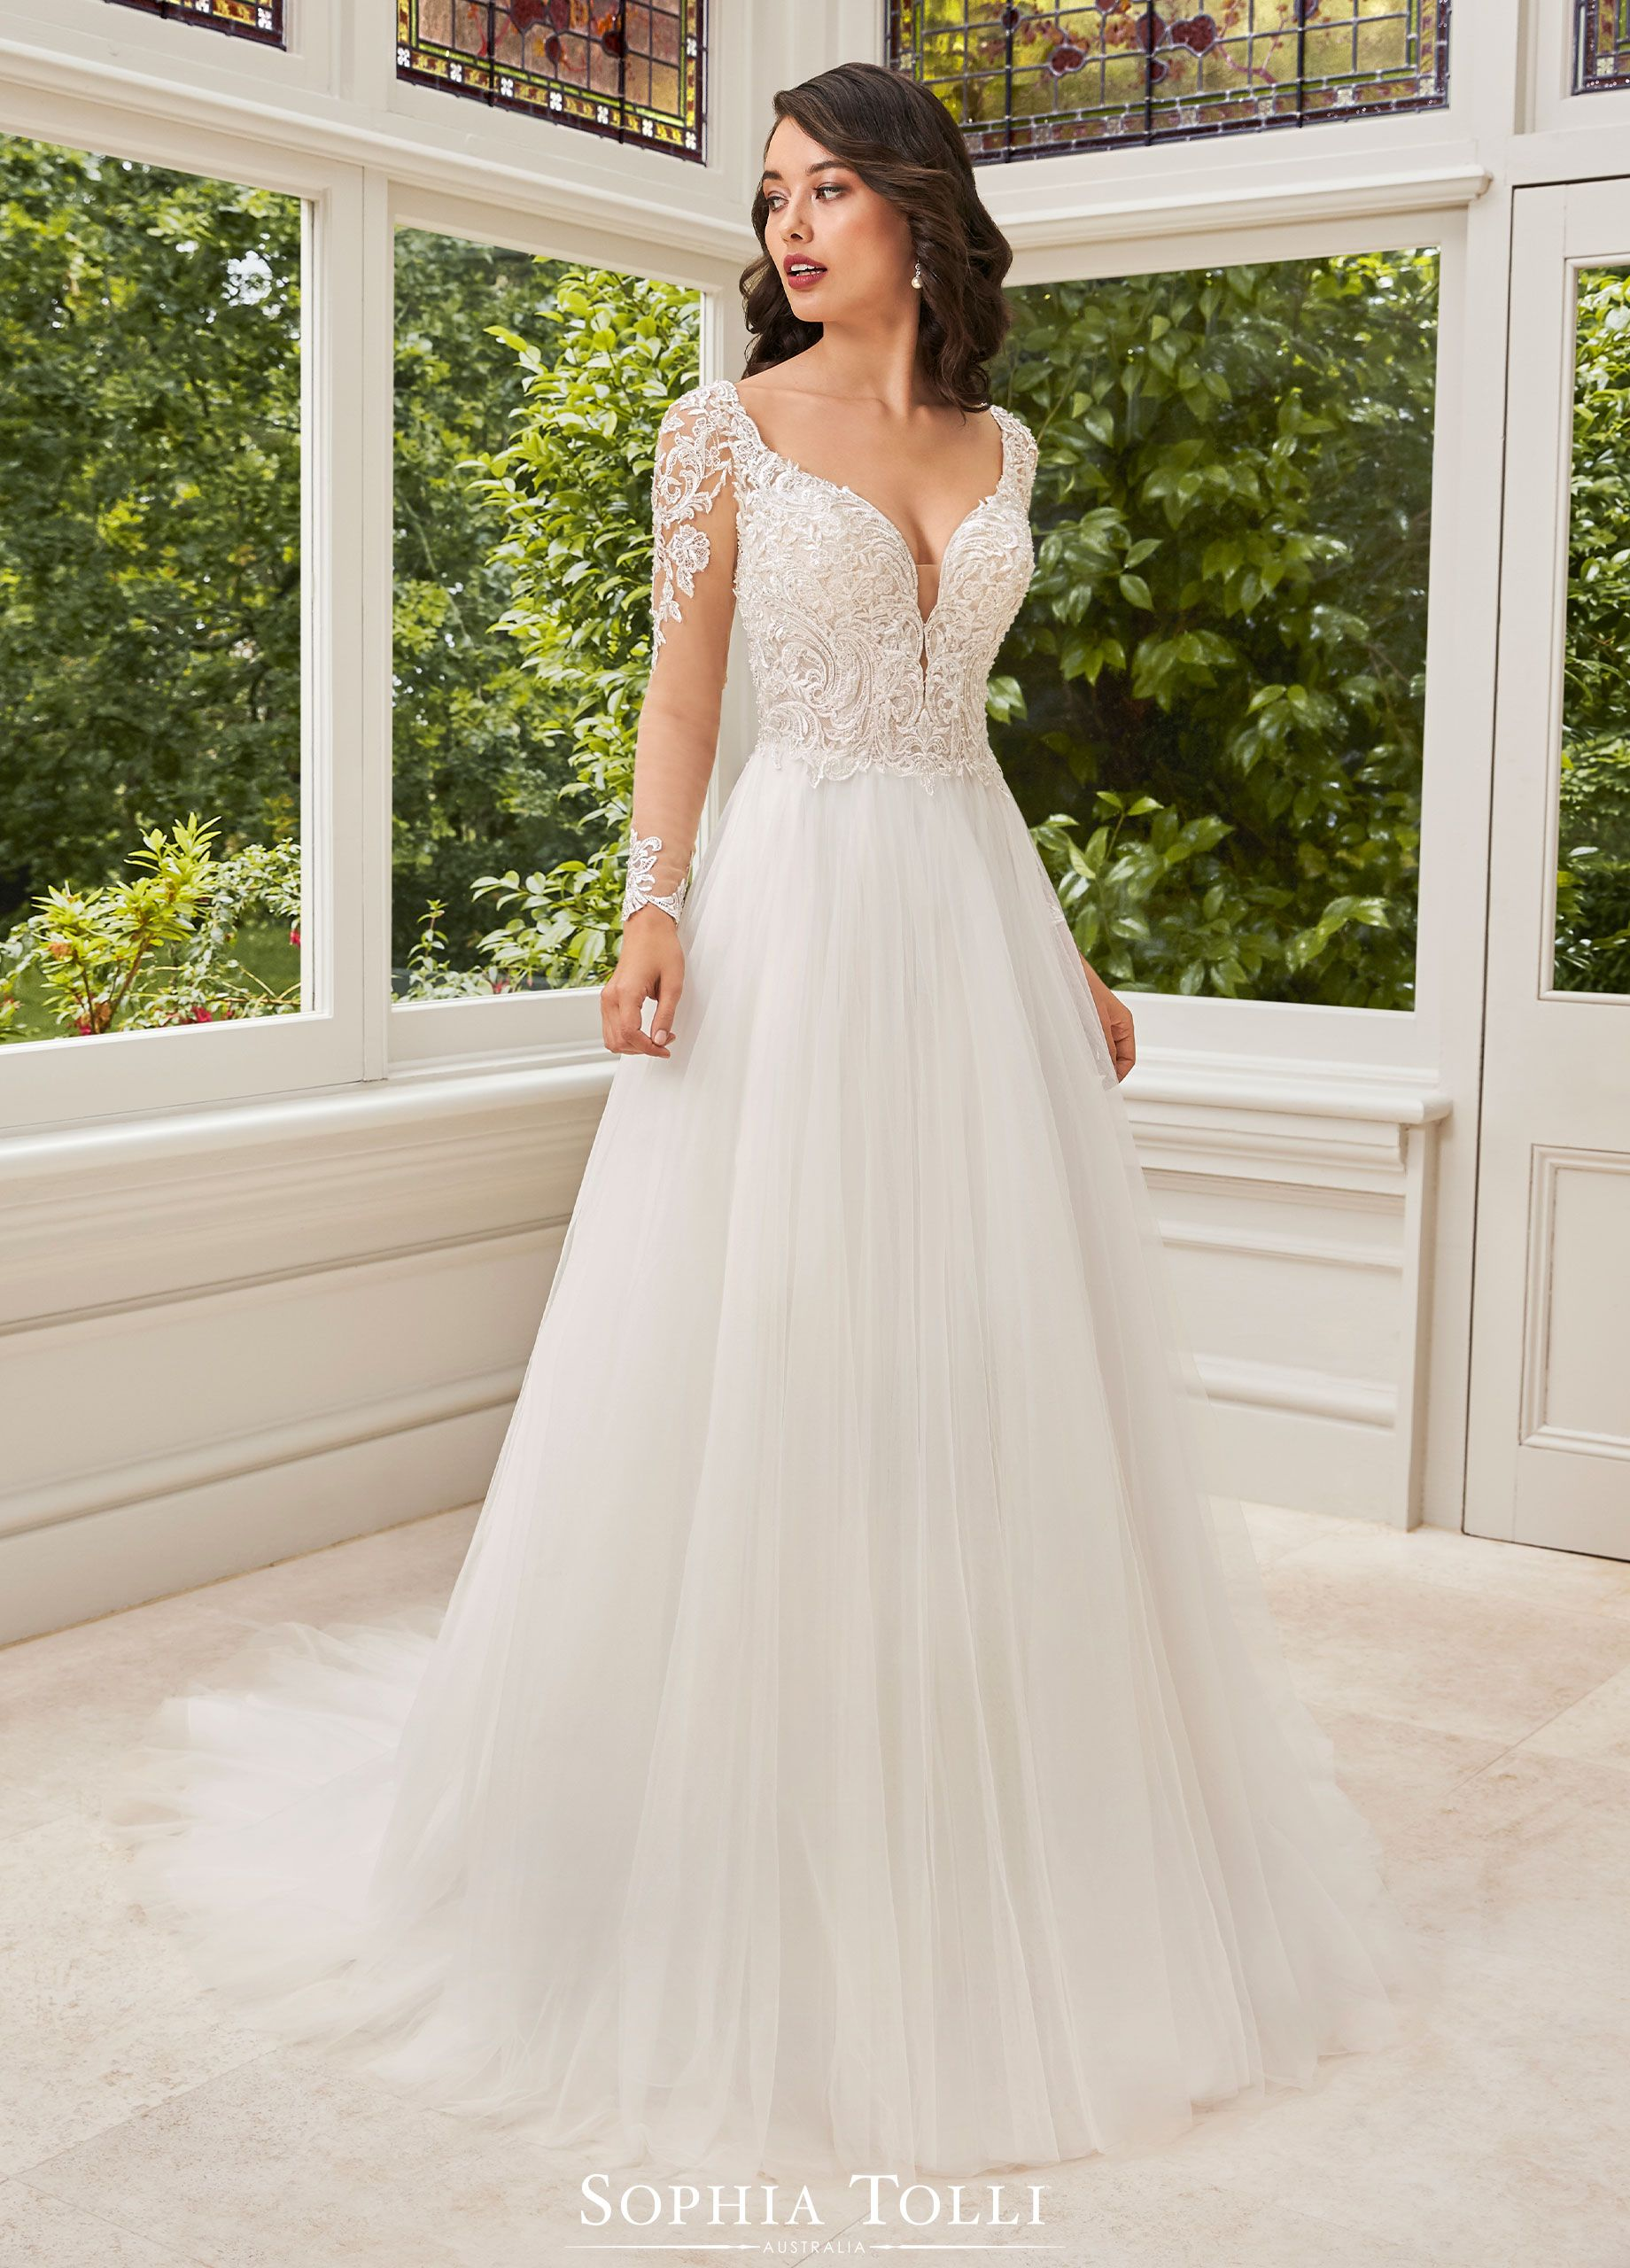 Sophia Tolli Kaia Wedding Dresses With Flowers Sophia Tolli Wedding Dresses Gold Wedding Gowns